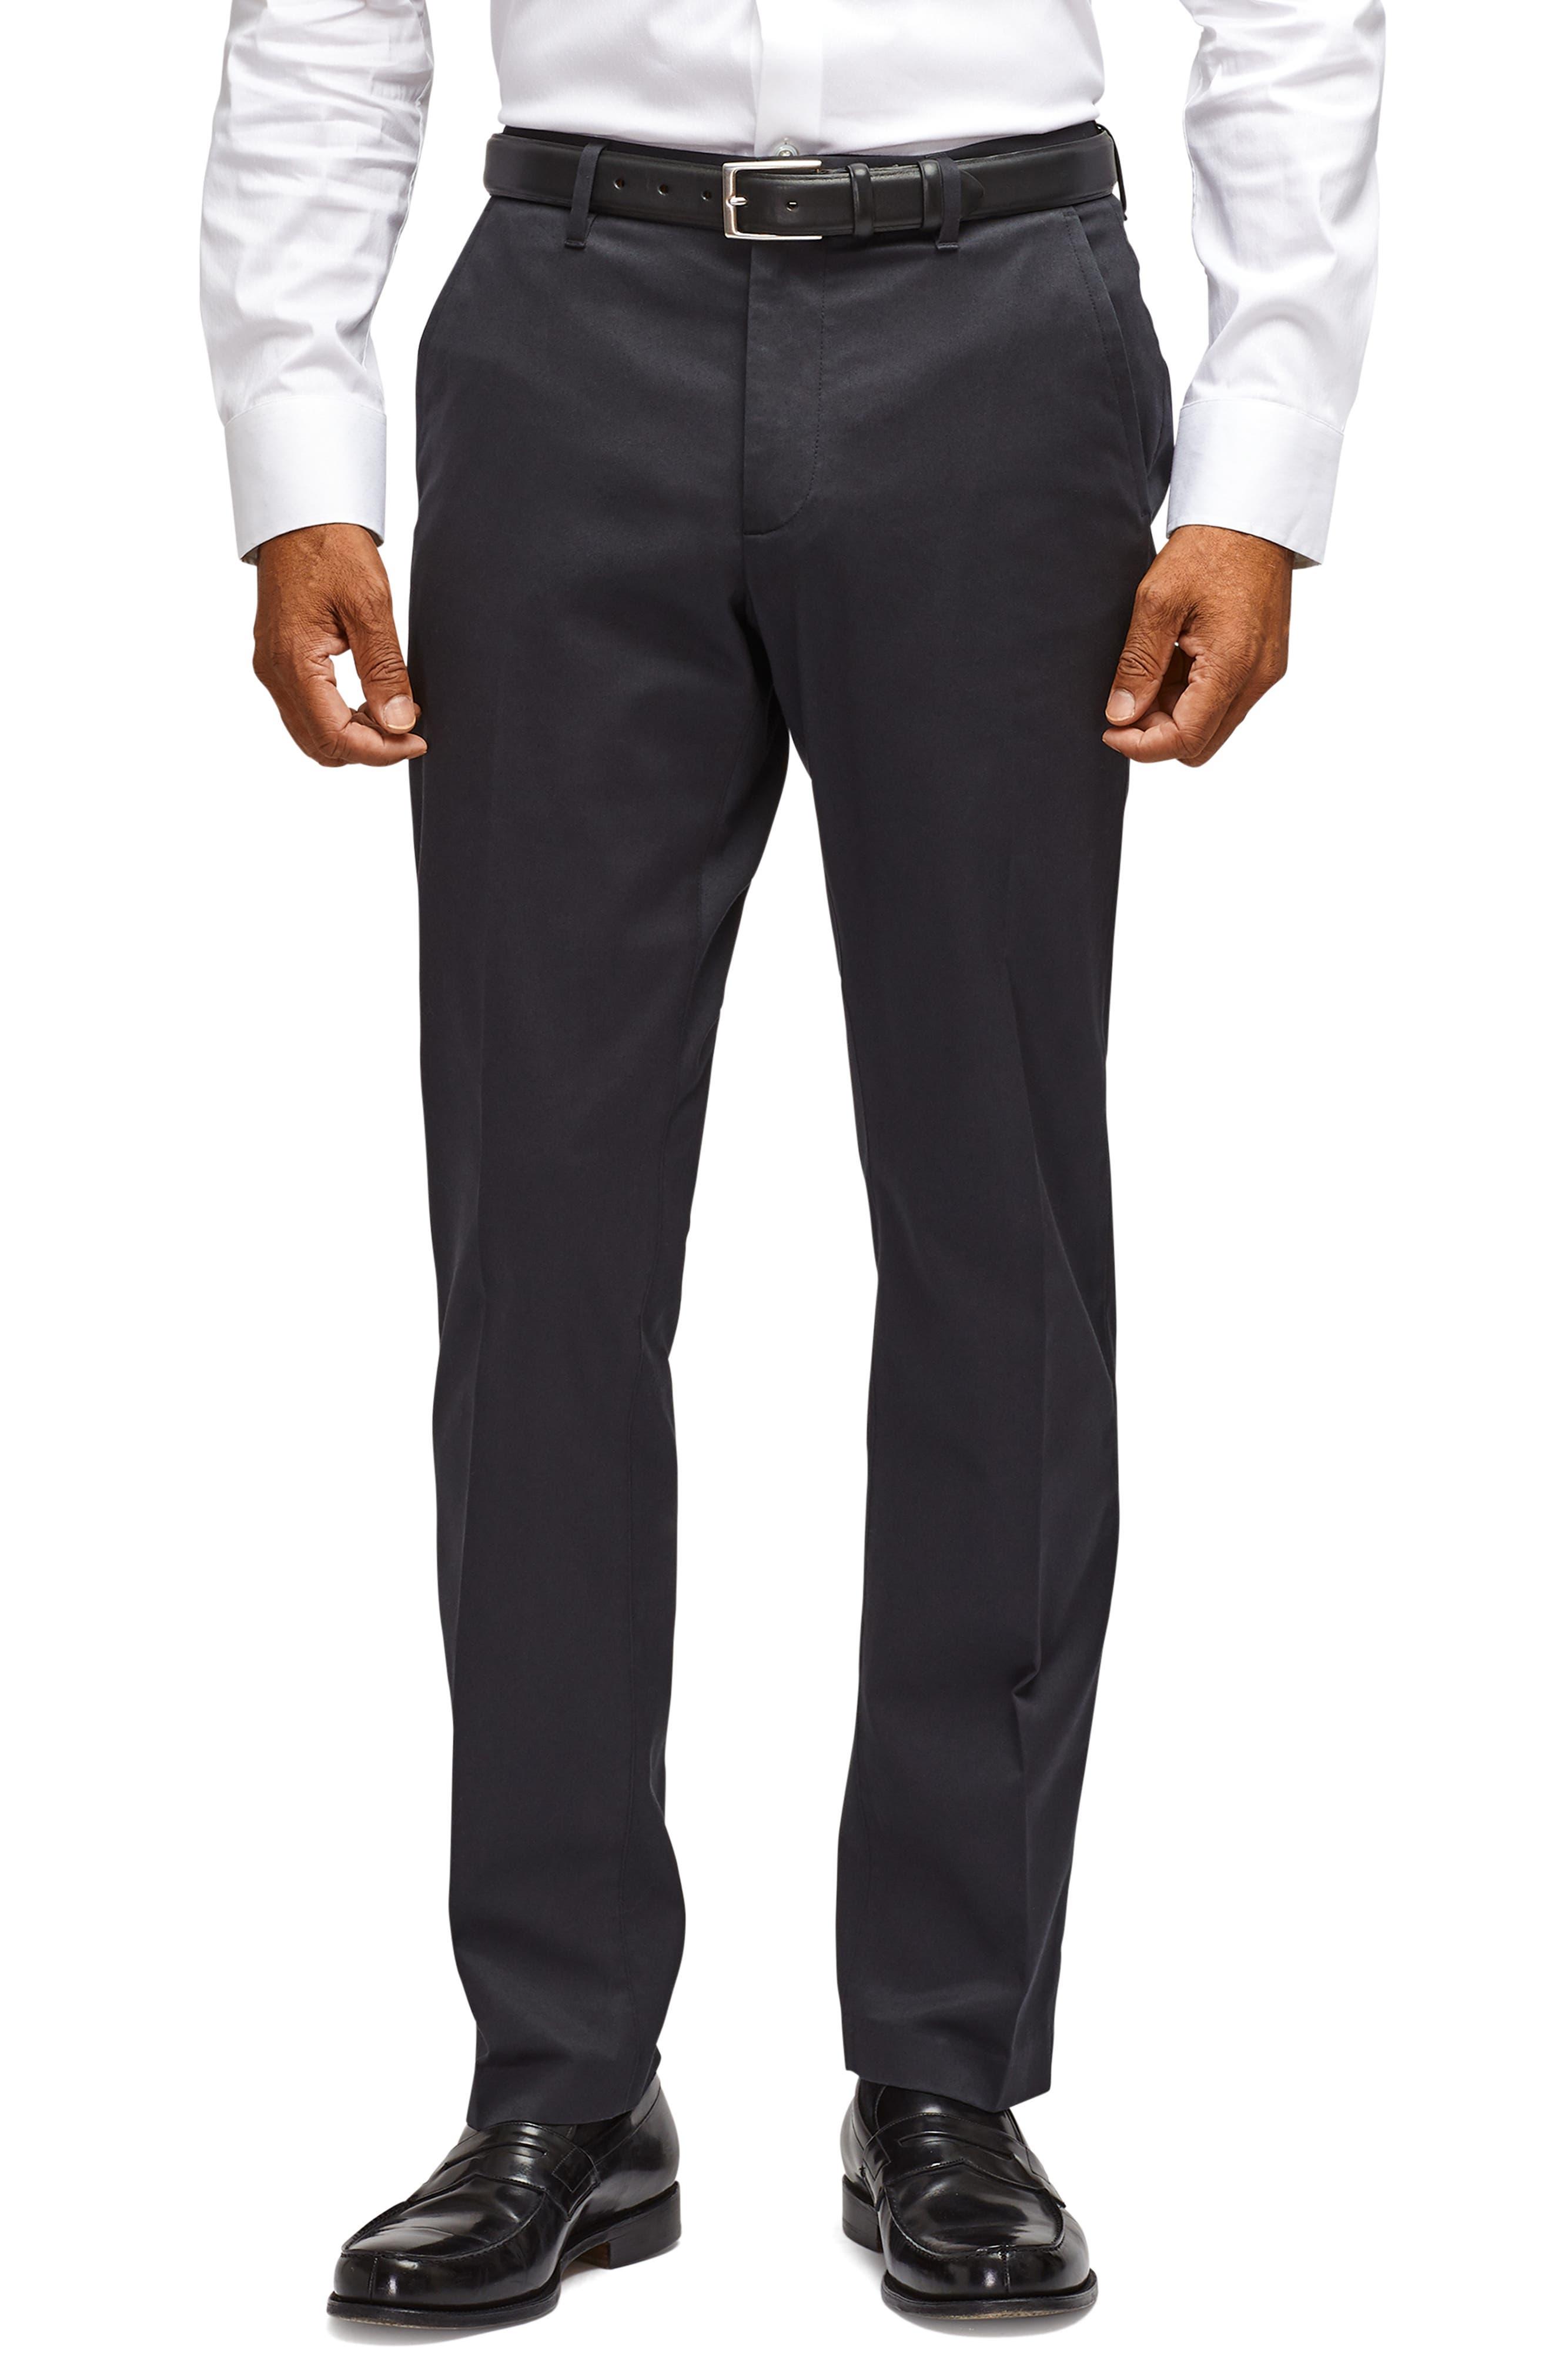 BONOBOS, Weekday Warrior Slim Fit Stretch Dress Pants, Main thumbnail 1, color, BLACK